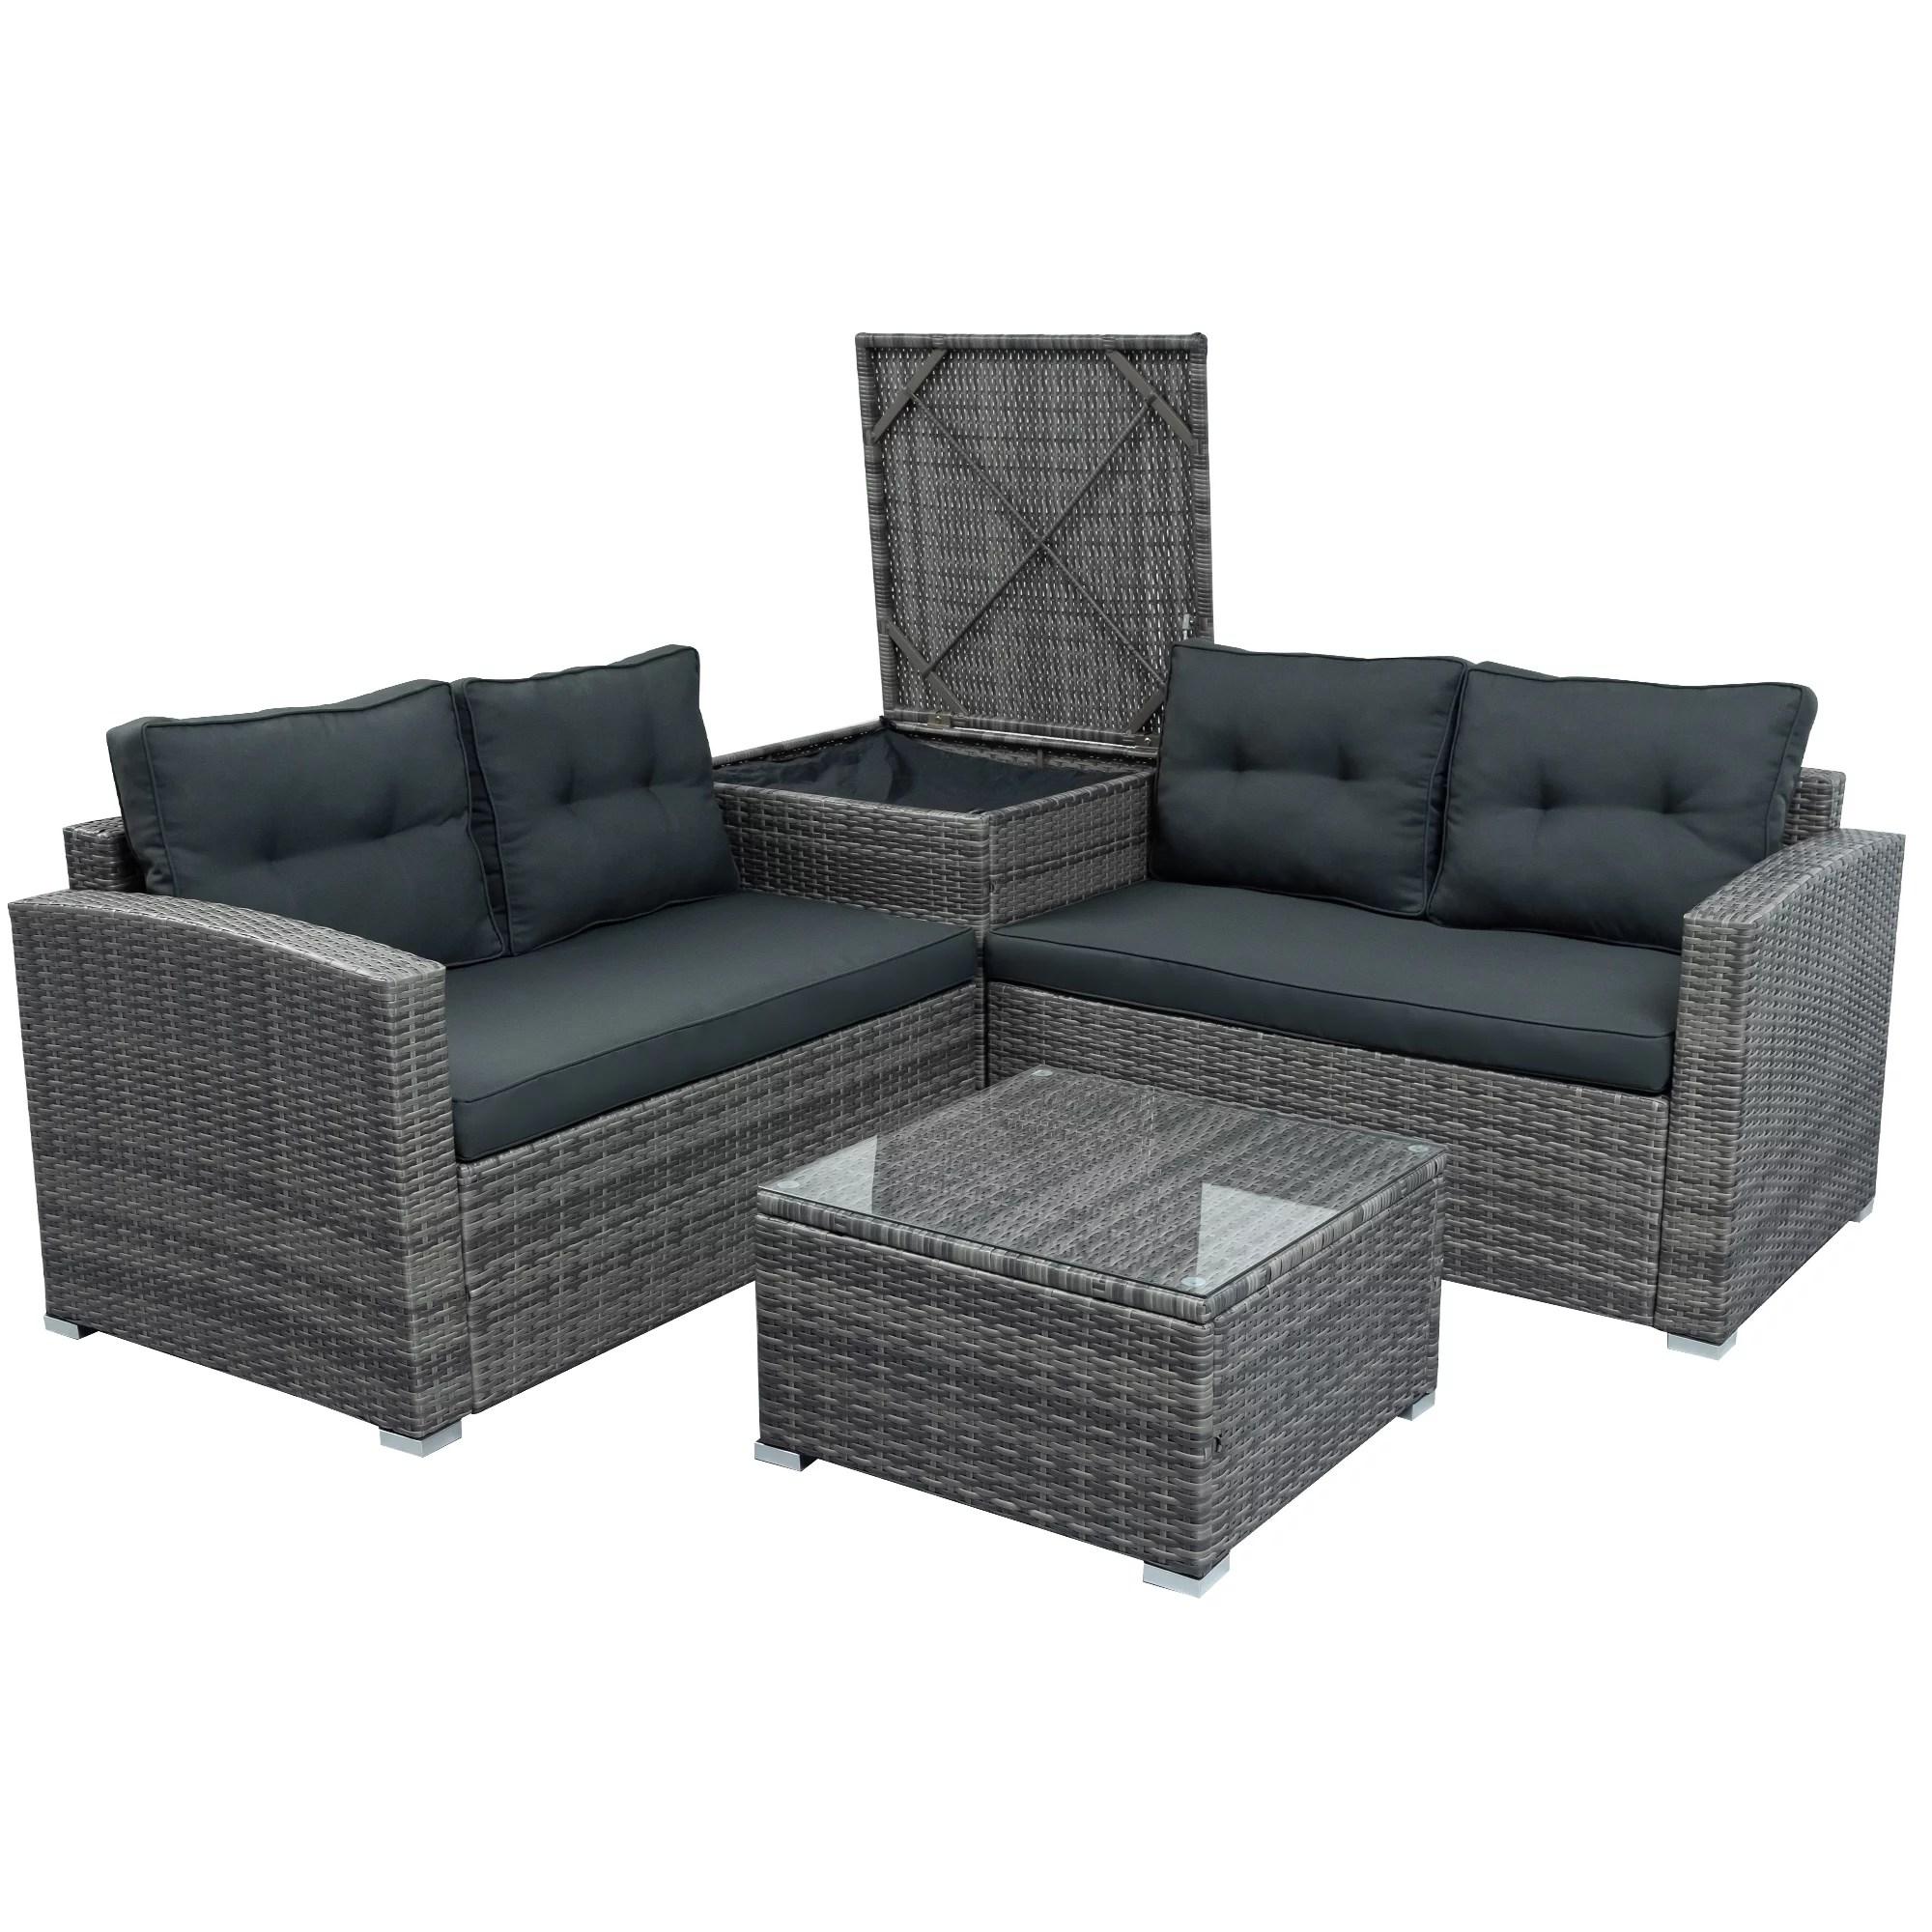 gray wicker patio furniture sets on for backyard 2020 upgrade new 4 piece wicker conversation set w l seats sofa r seats sofa single sofa tempered